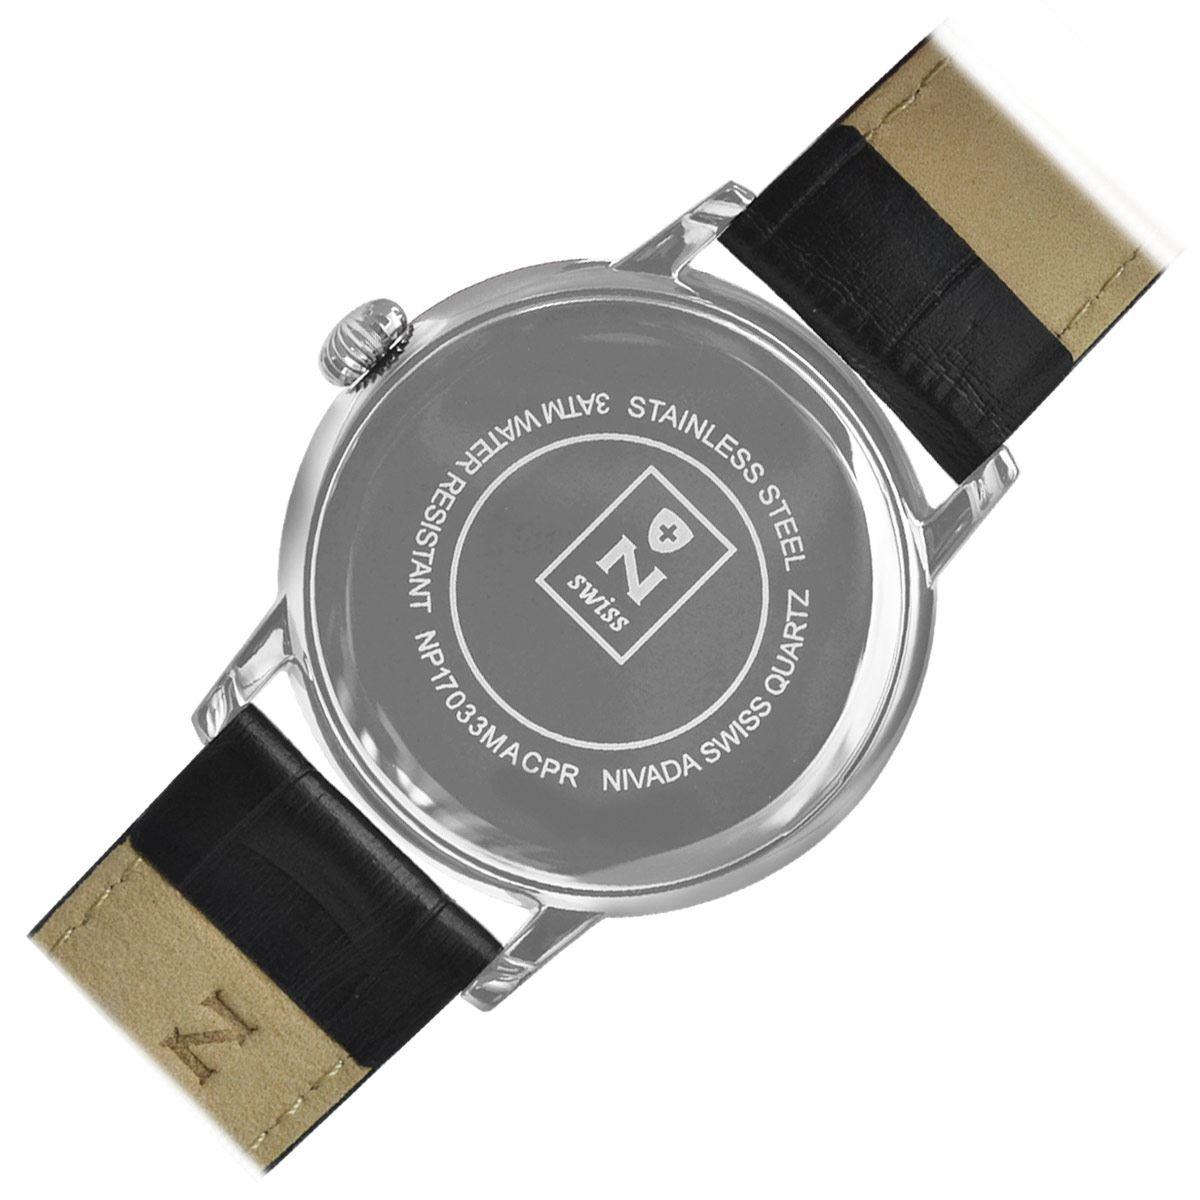 Reloj Nivada NP17033MACPR Caballero